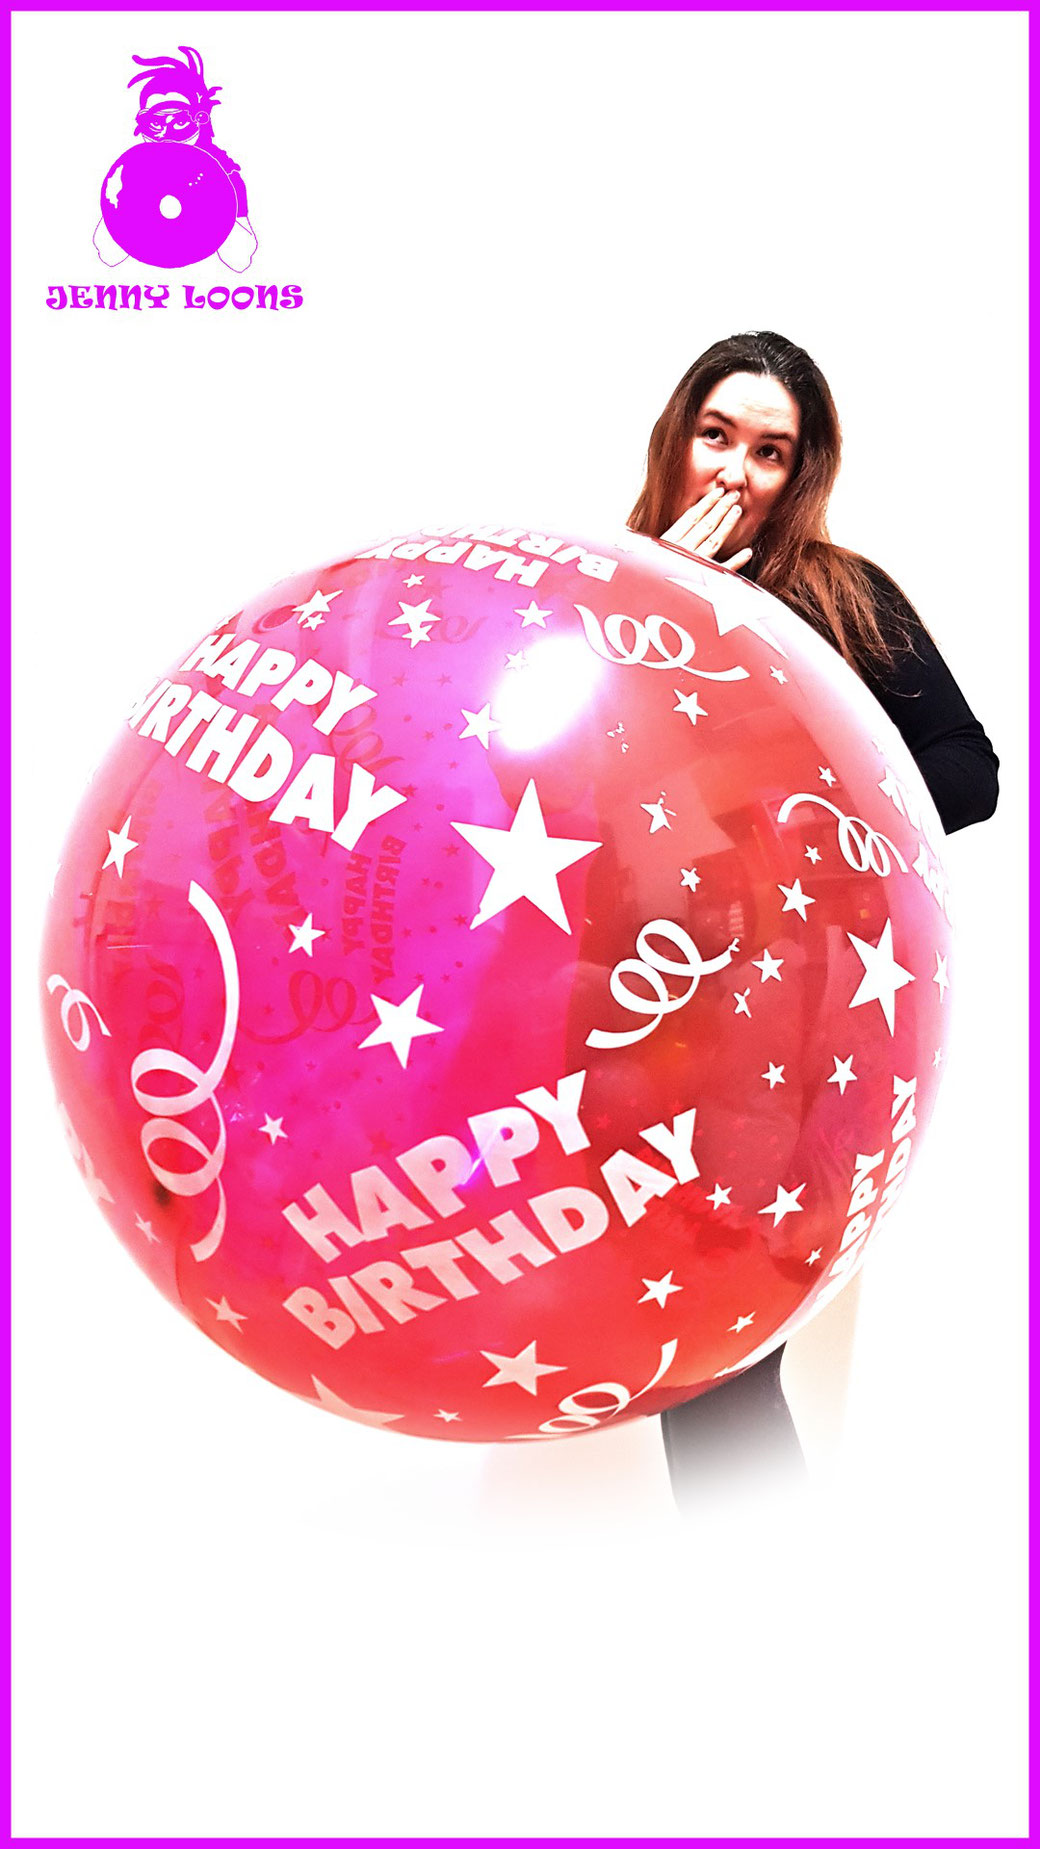 JENNY LOONS CATTEX 32inch 81cm Riesenballon Giant Balloon Happy Birthday Geburtstag